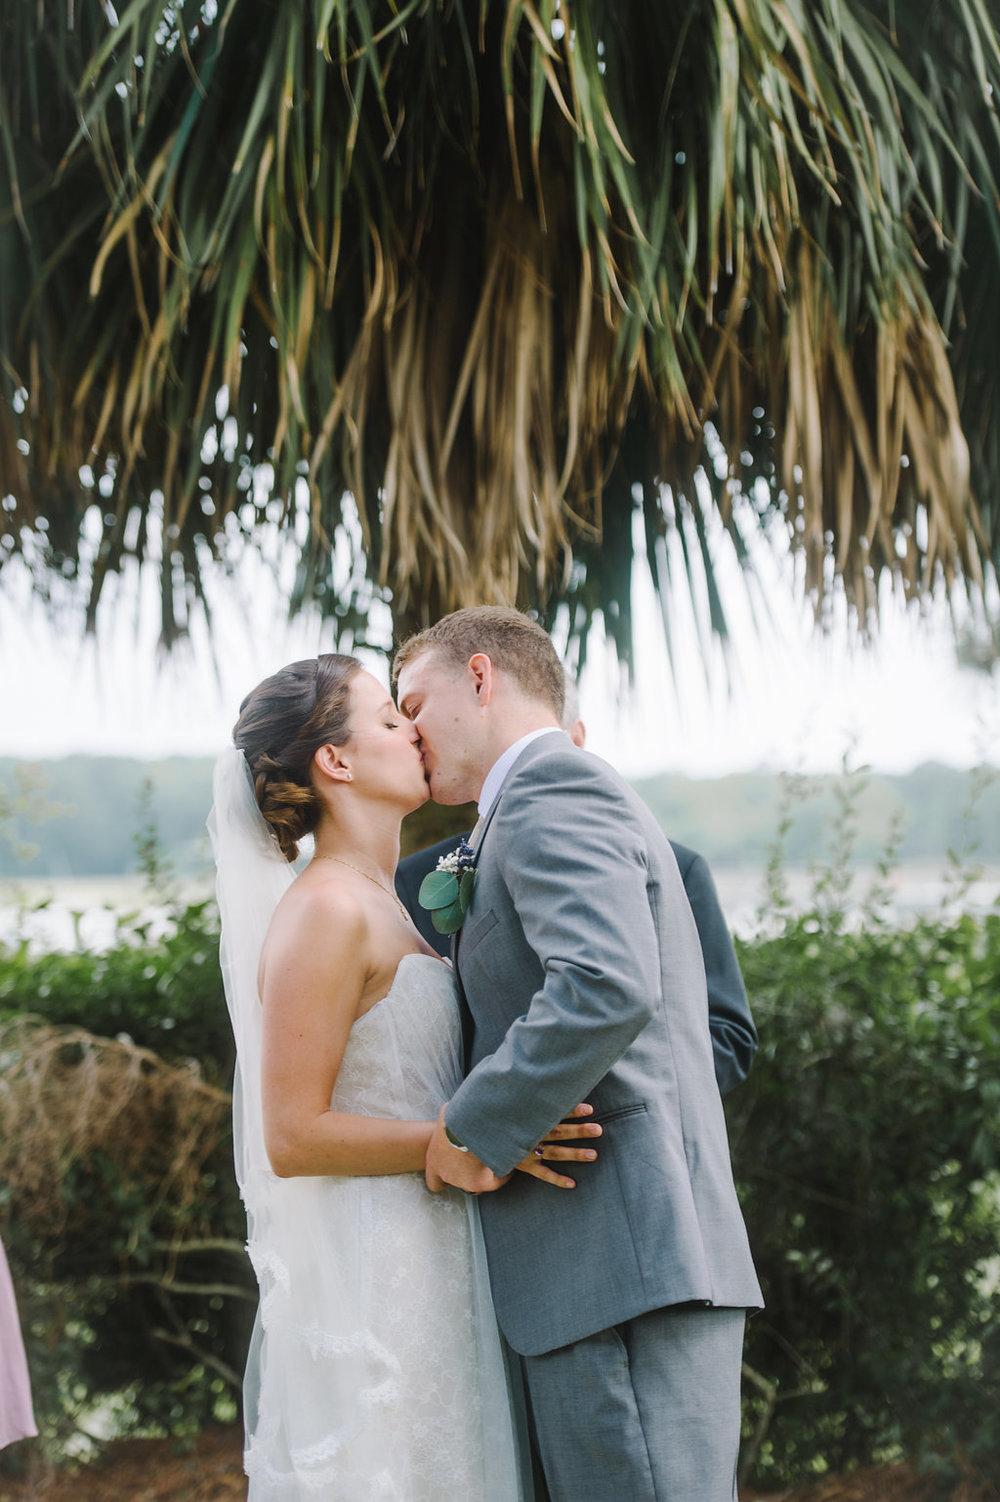 meagan-and-brenden-rach-loves-troy-photography-ivory-and-beau-bridal-boutqiue-ti-adora-wedding-dress-gold-lace-wedding-dress-savannah-wedding-planner-savannah-weddings-oldfield-plantation-wedding-savannah-florist-78.jpg